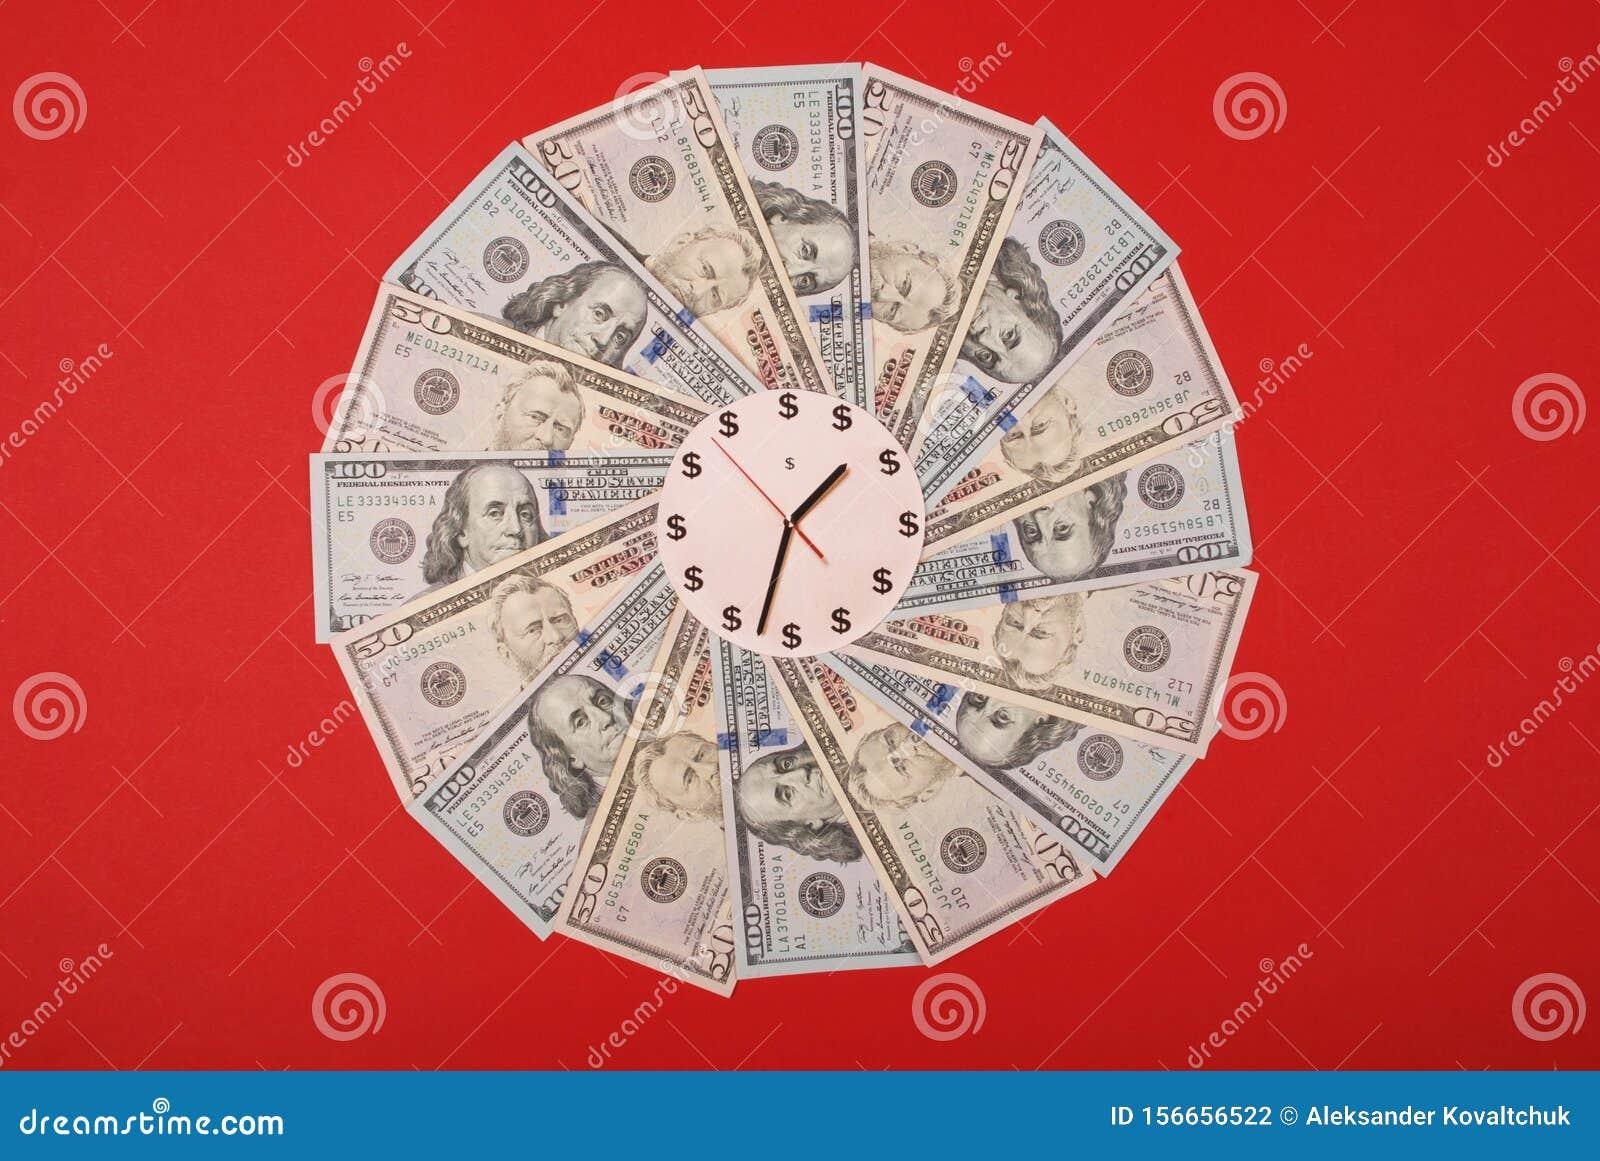 Concept of clock and dollar. Clock on mandala kaleidoscope from money. Abstract money background raster pattern repeat mandala